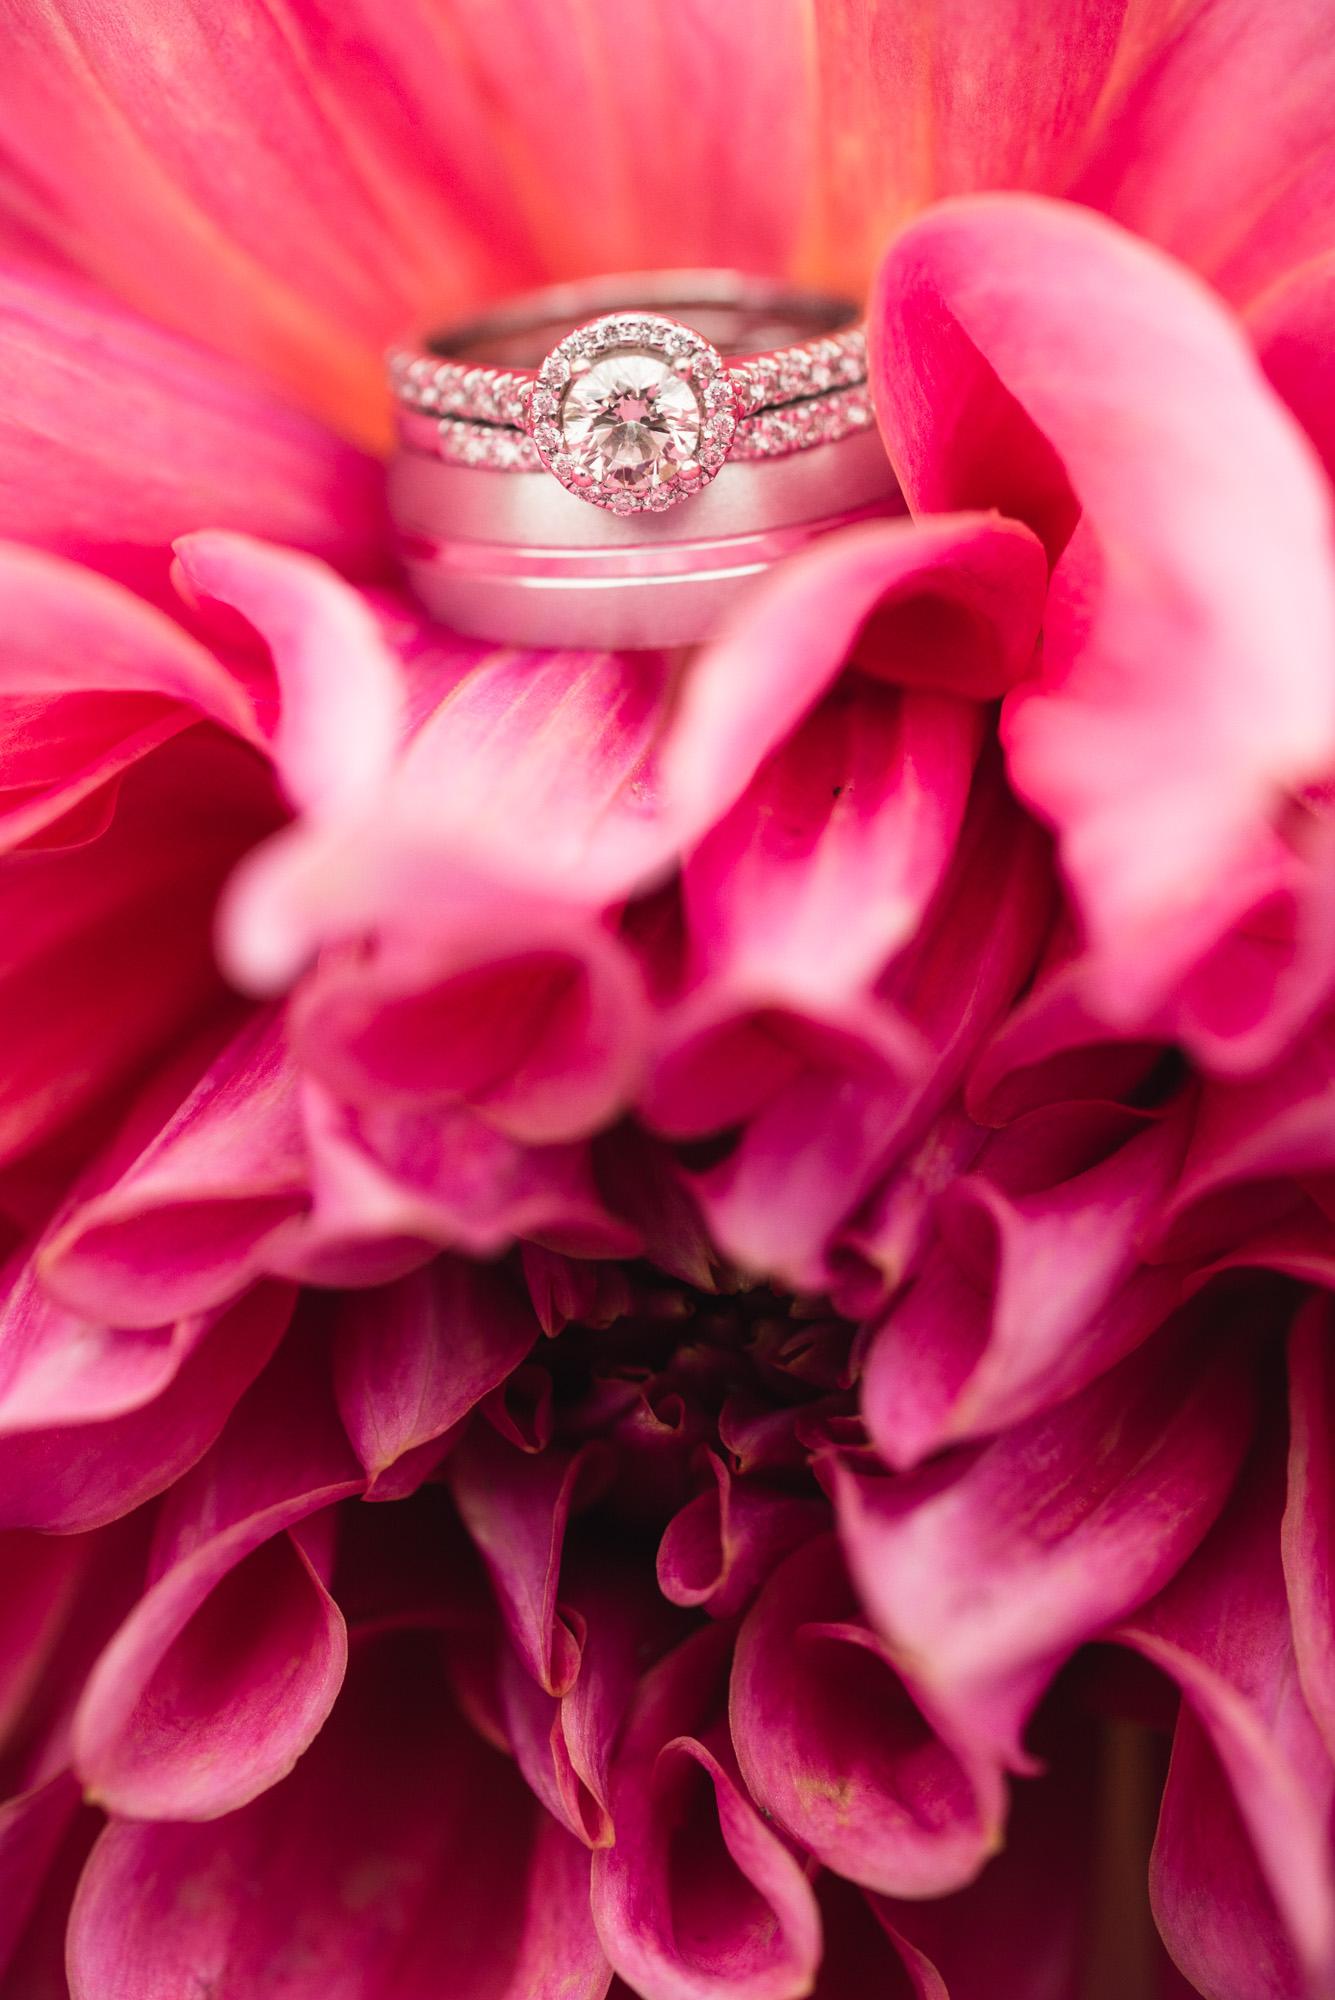 White gold ring details on pink flower